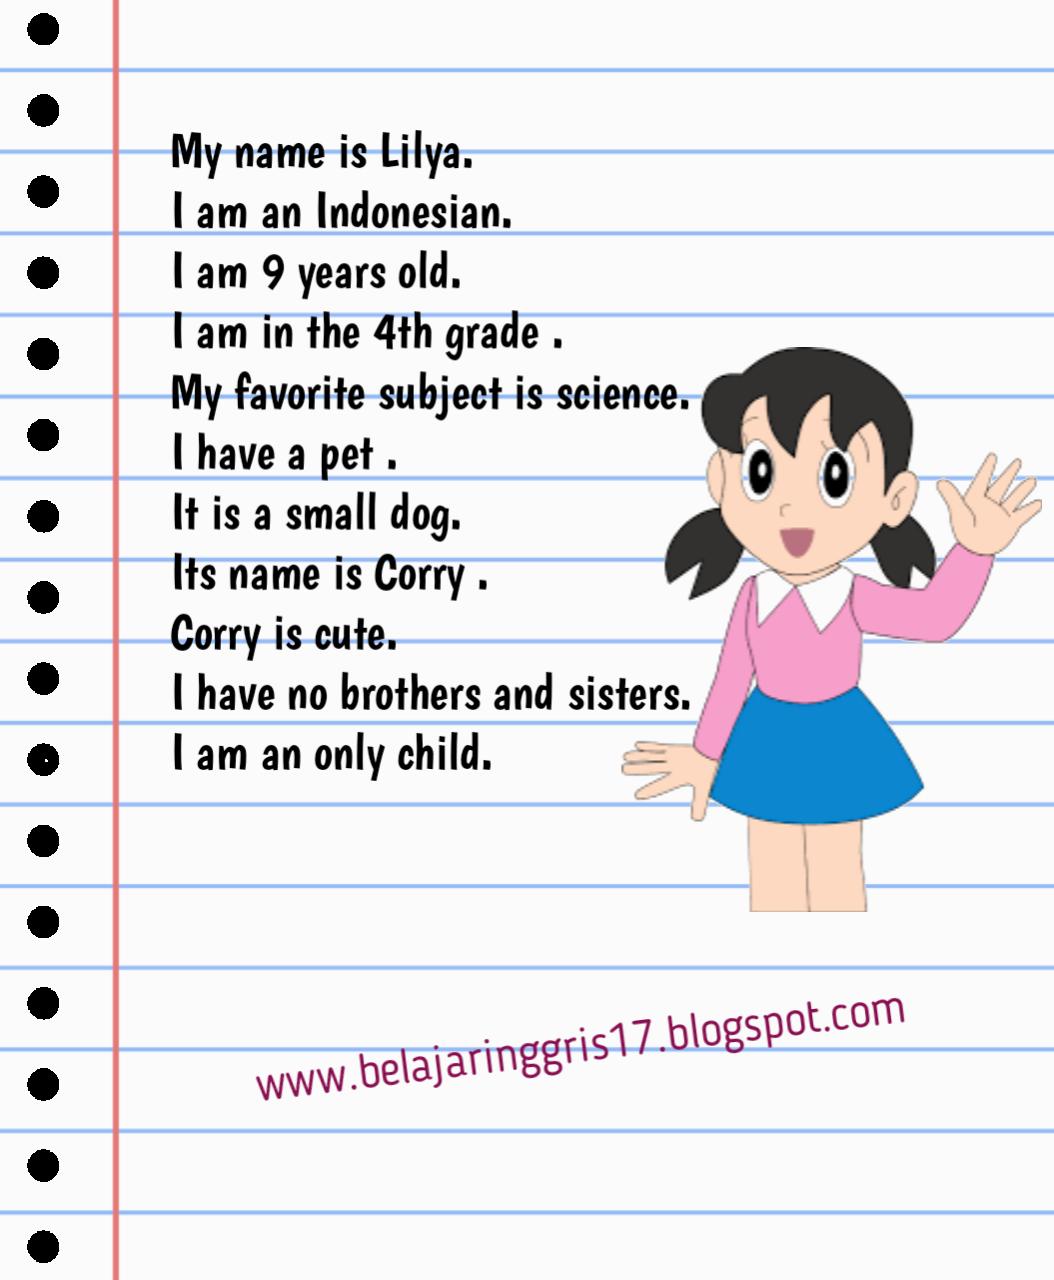 Contoh Perkenalan Diri Dalam Bahasa Inggris : contoh, perkenalan, dalam, bahasa, inggris, Perkenalan, Bahasa, Inggris, Belajar